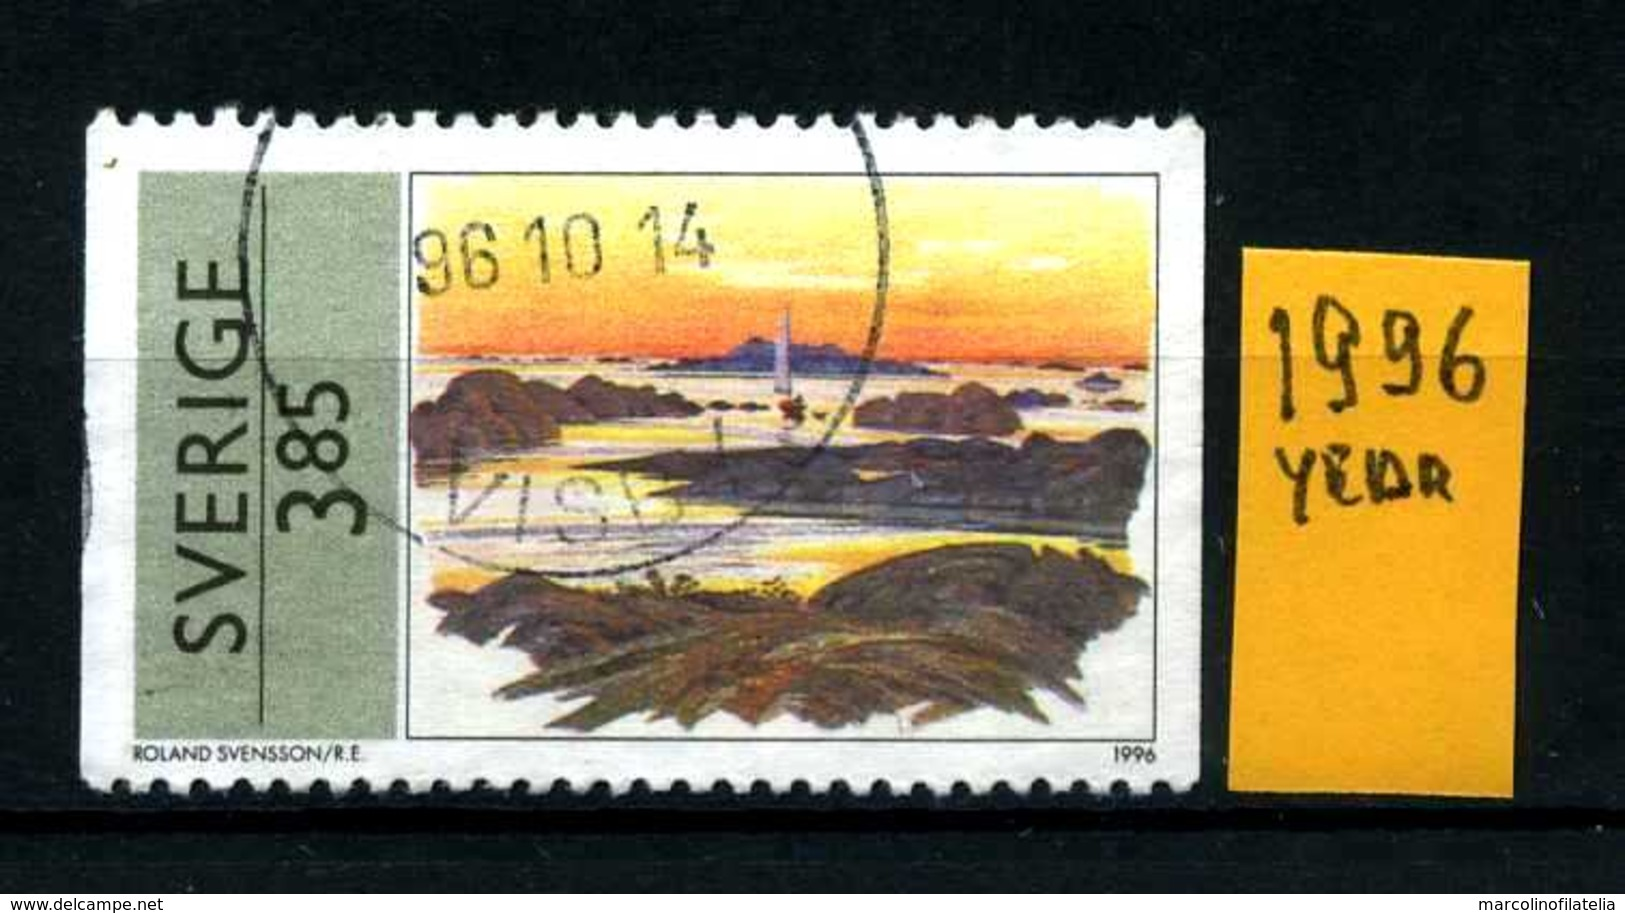 SVEZIA - SVERIGE - Year 1996 - Usato - Used - Utilisè - Gebraucht.- - Zweden